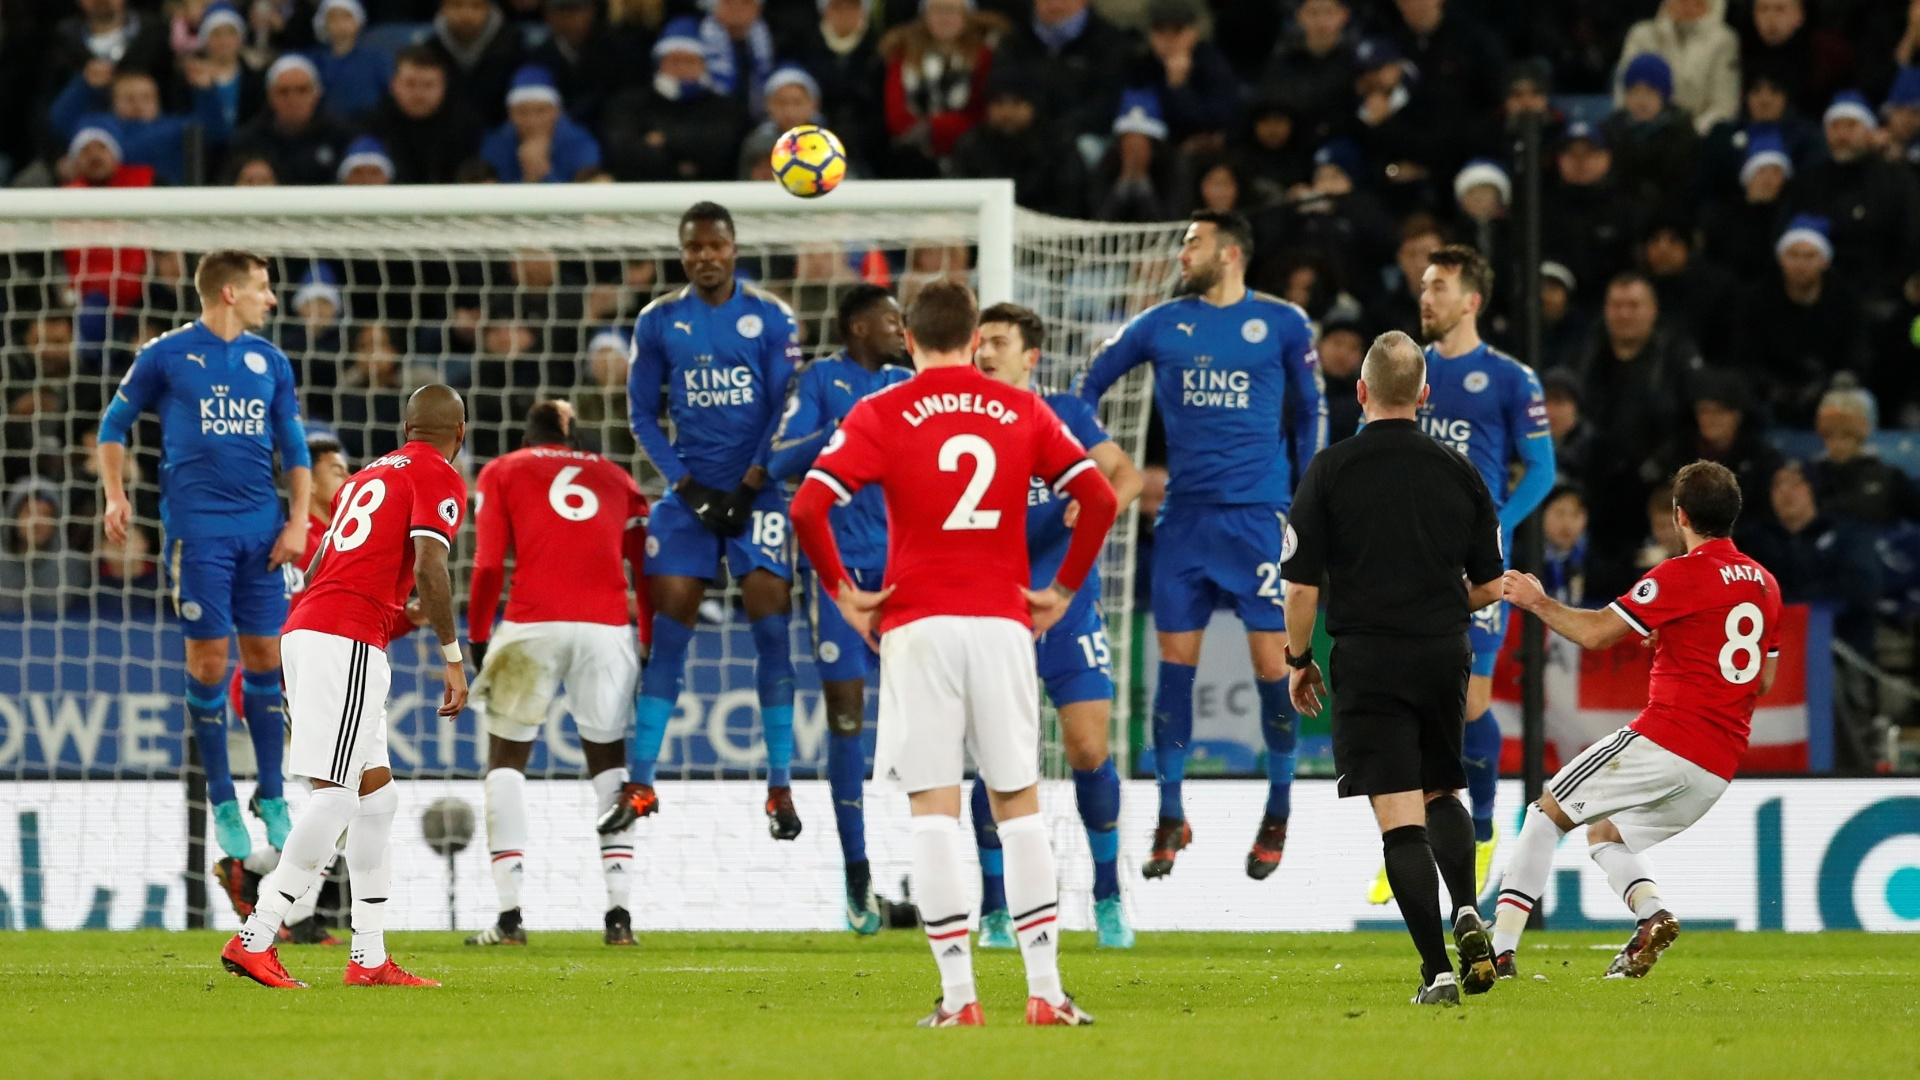 Juan Mata acerta cobrança de falta, marcando o segundo gol do Manchester United contra o Leicester